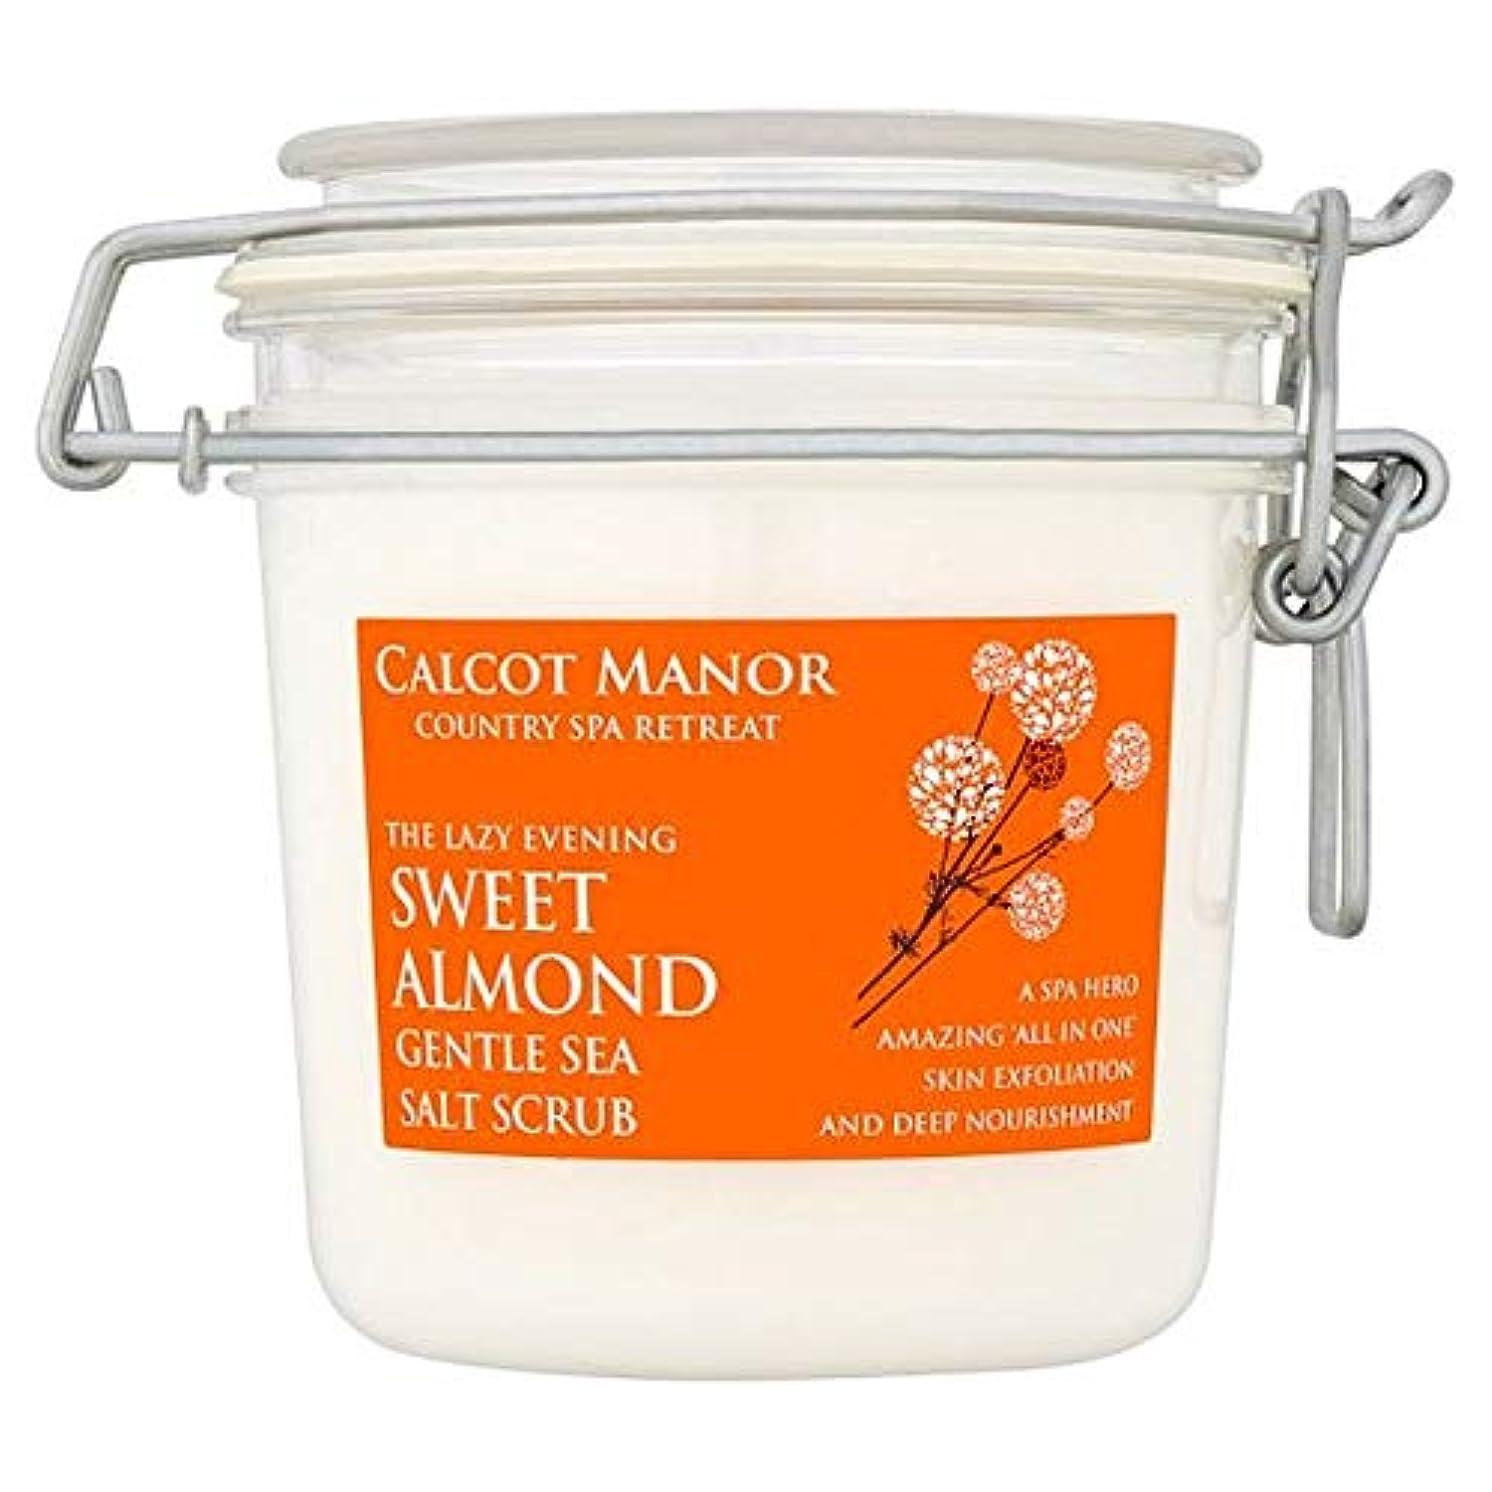 [Blue Orange] カルコットマナースイートアーモンド海塩スクラブ350ミリリットル - Calcot Manor Sweet Almond Sea Salt Scrub 350Ml [並行輸入品]